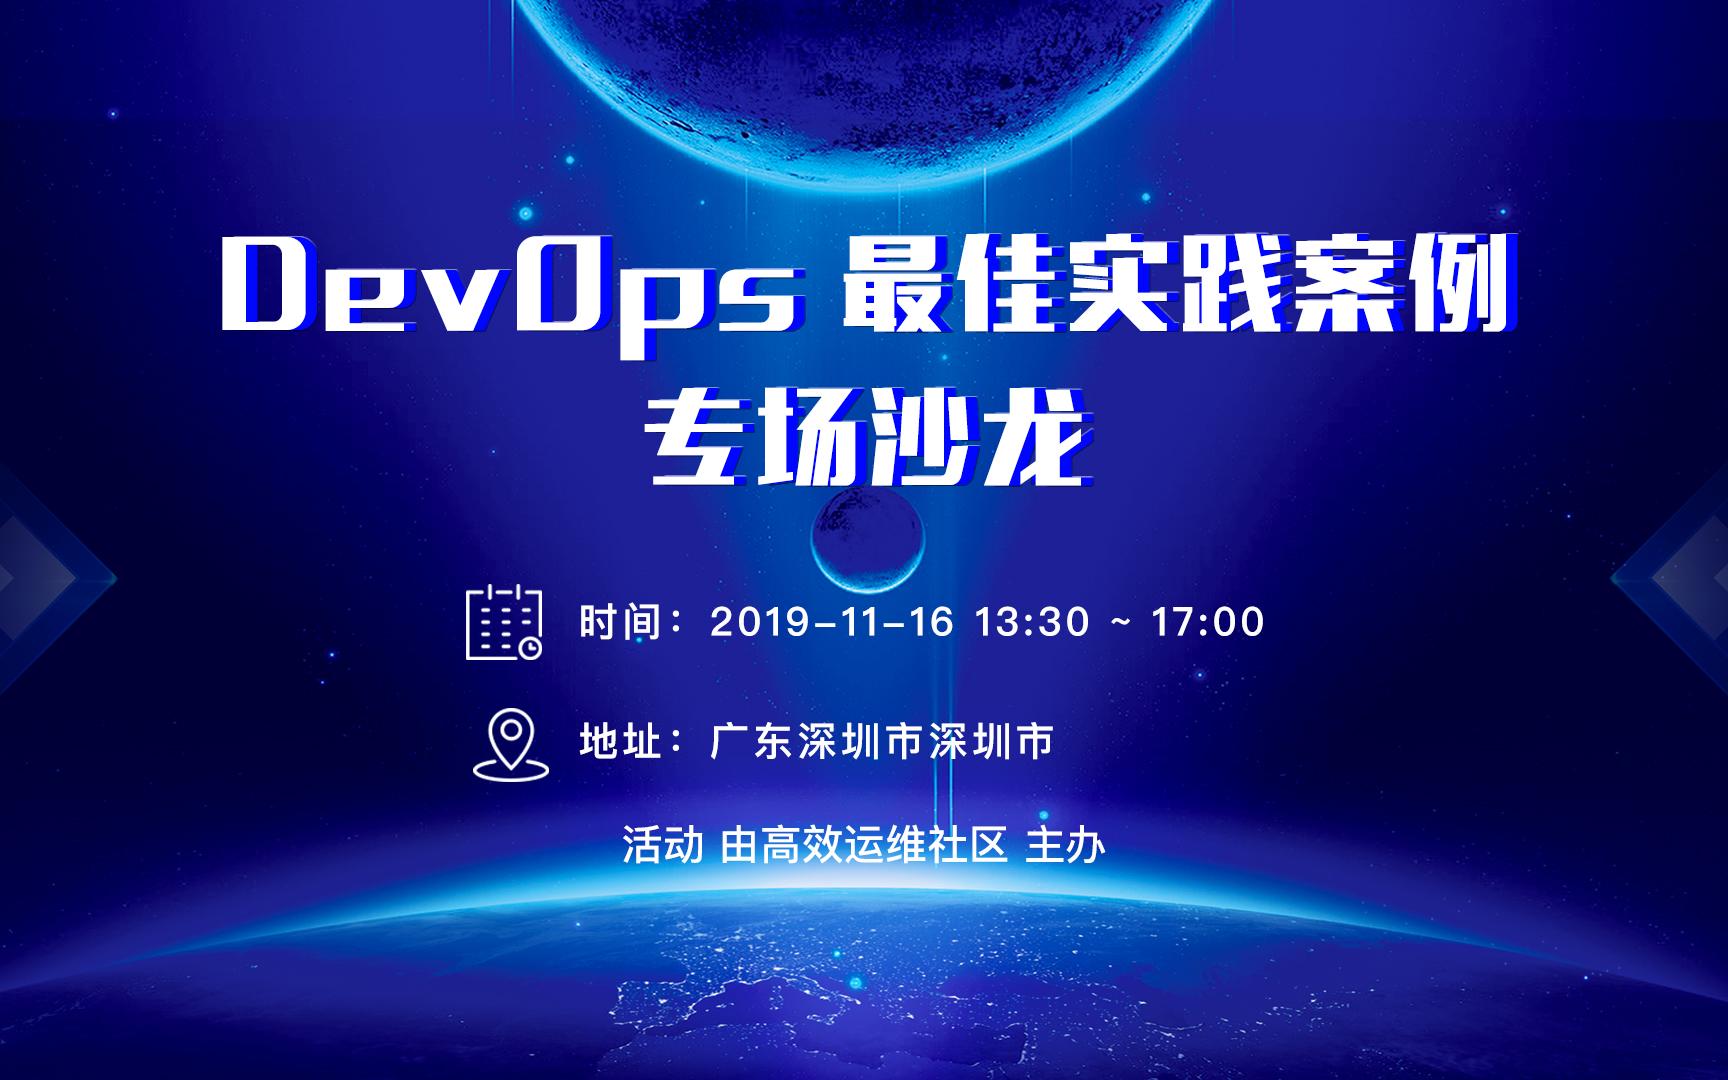 2019 DevOps最佳實踐案例專場沙龍(深圳)